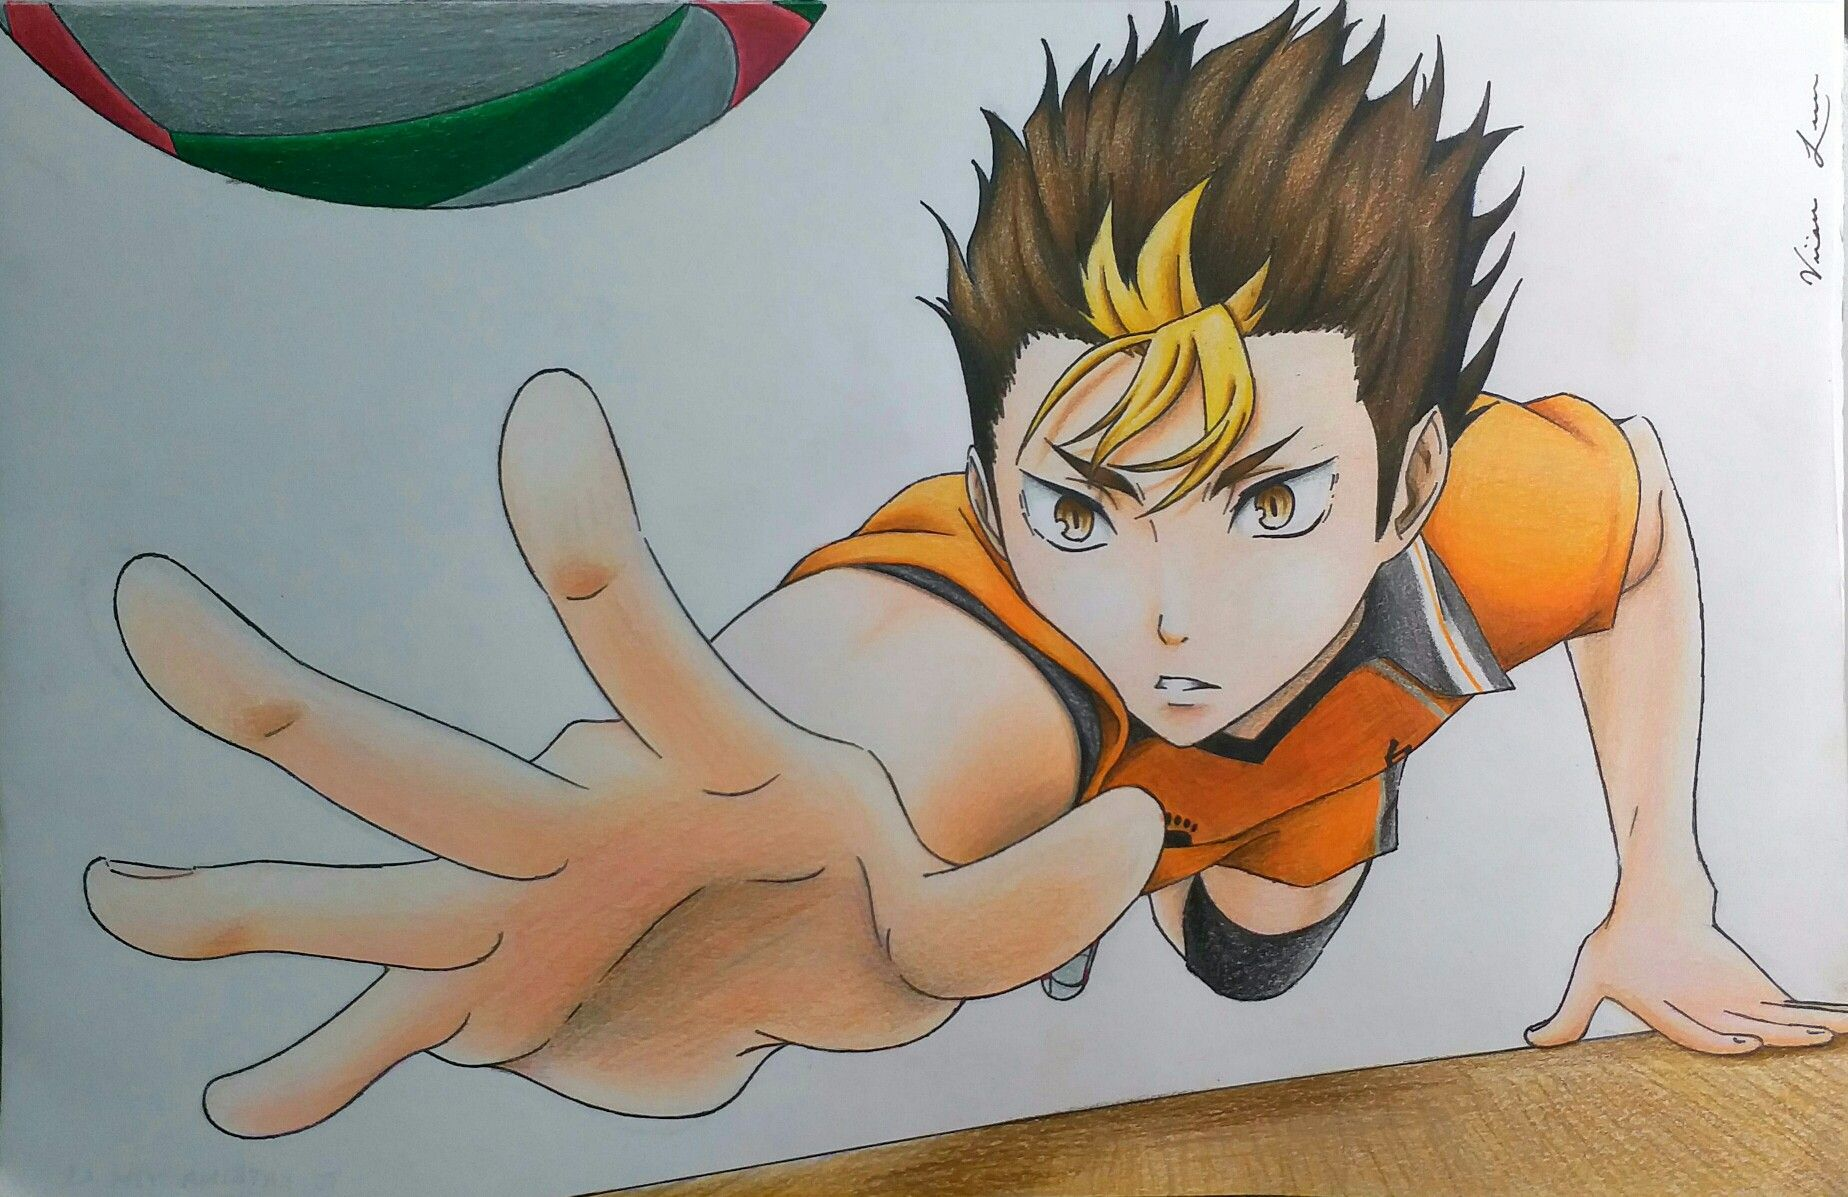 Colour Pencil Drawing Of Nishinoya Yuu Nishinoya Yuu Nishinoyayuu Noya Noyasan Haikyuu Haikyu Hq Karasuno Vol Drawings Anime Drawings Pencil Drawings